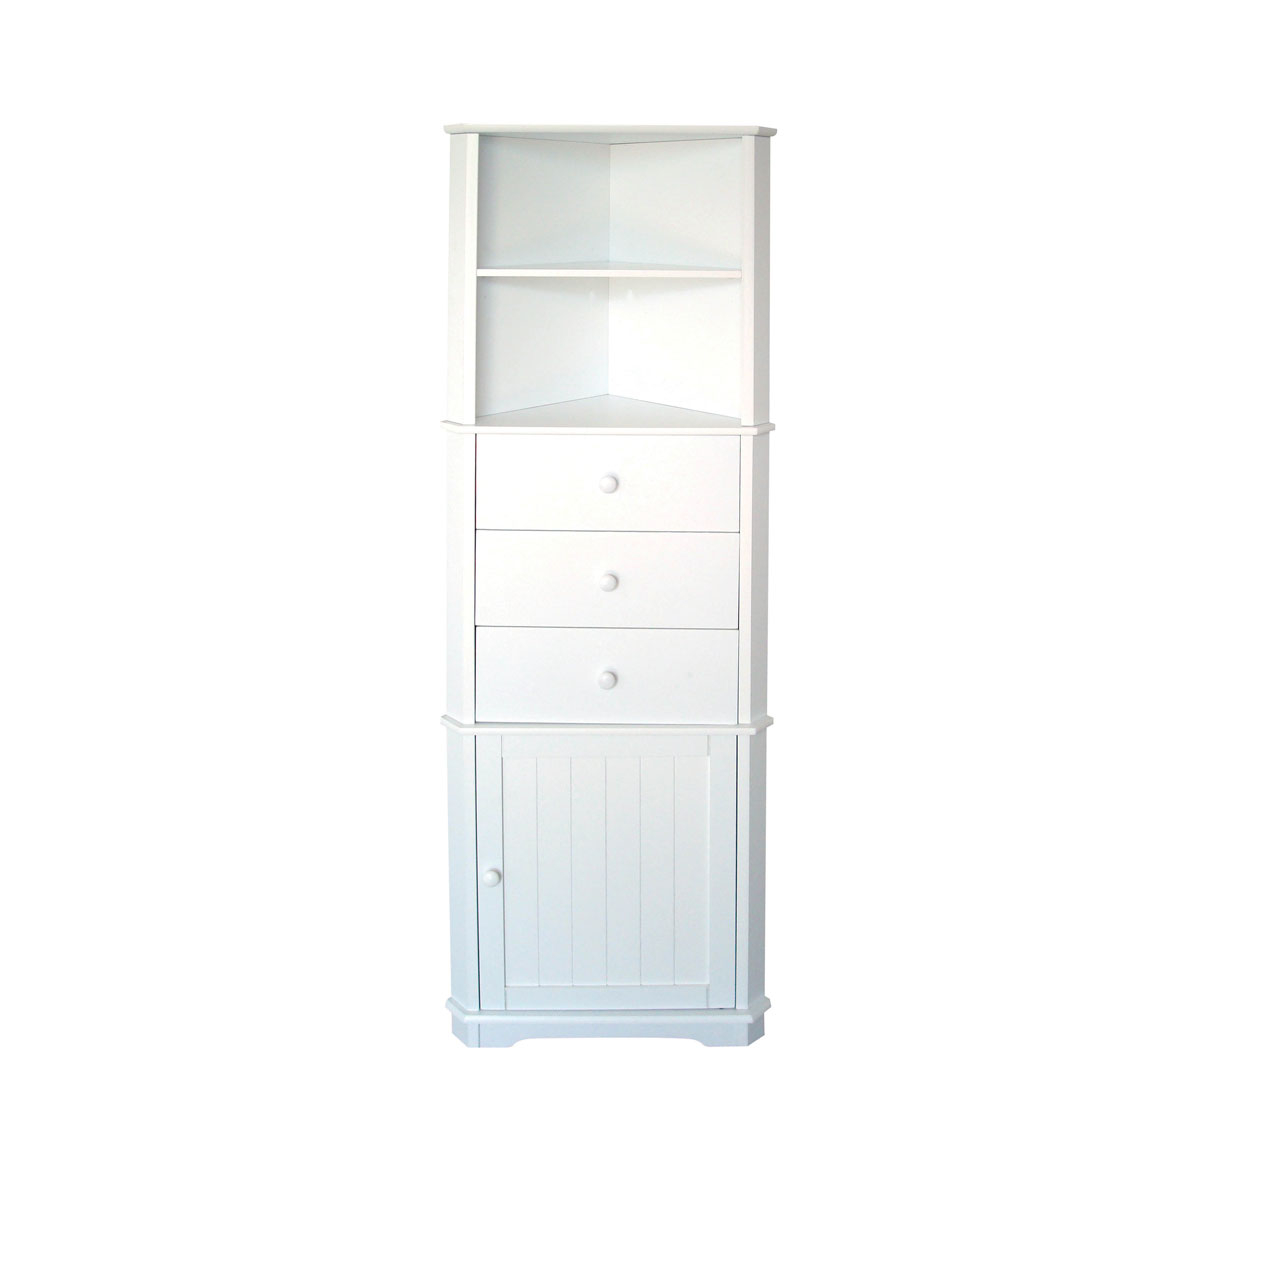 Bathroom Interesting White Wooden Bathroom Corner Shelf Unit for measurements 1280 X 1280